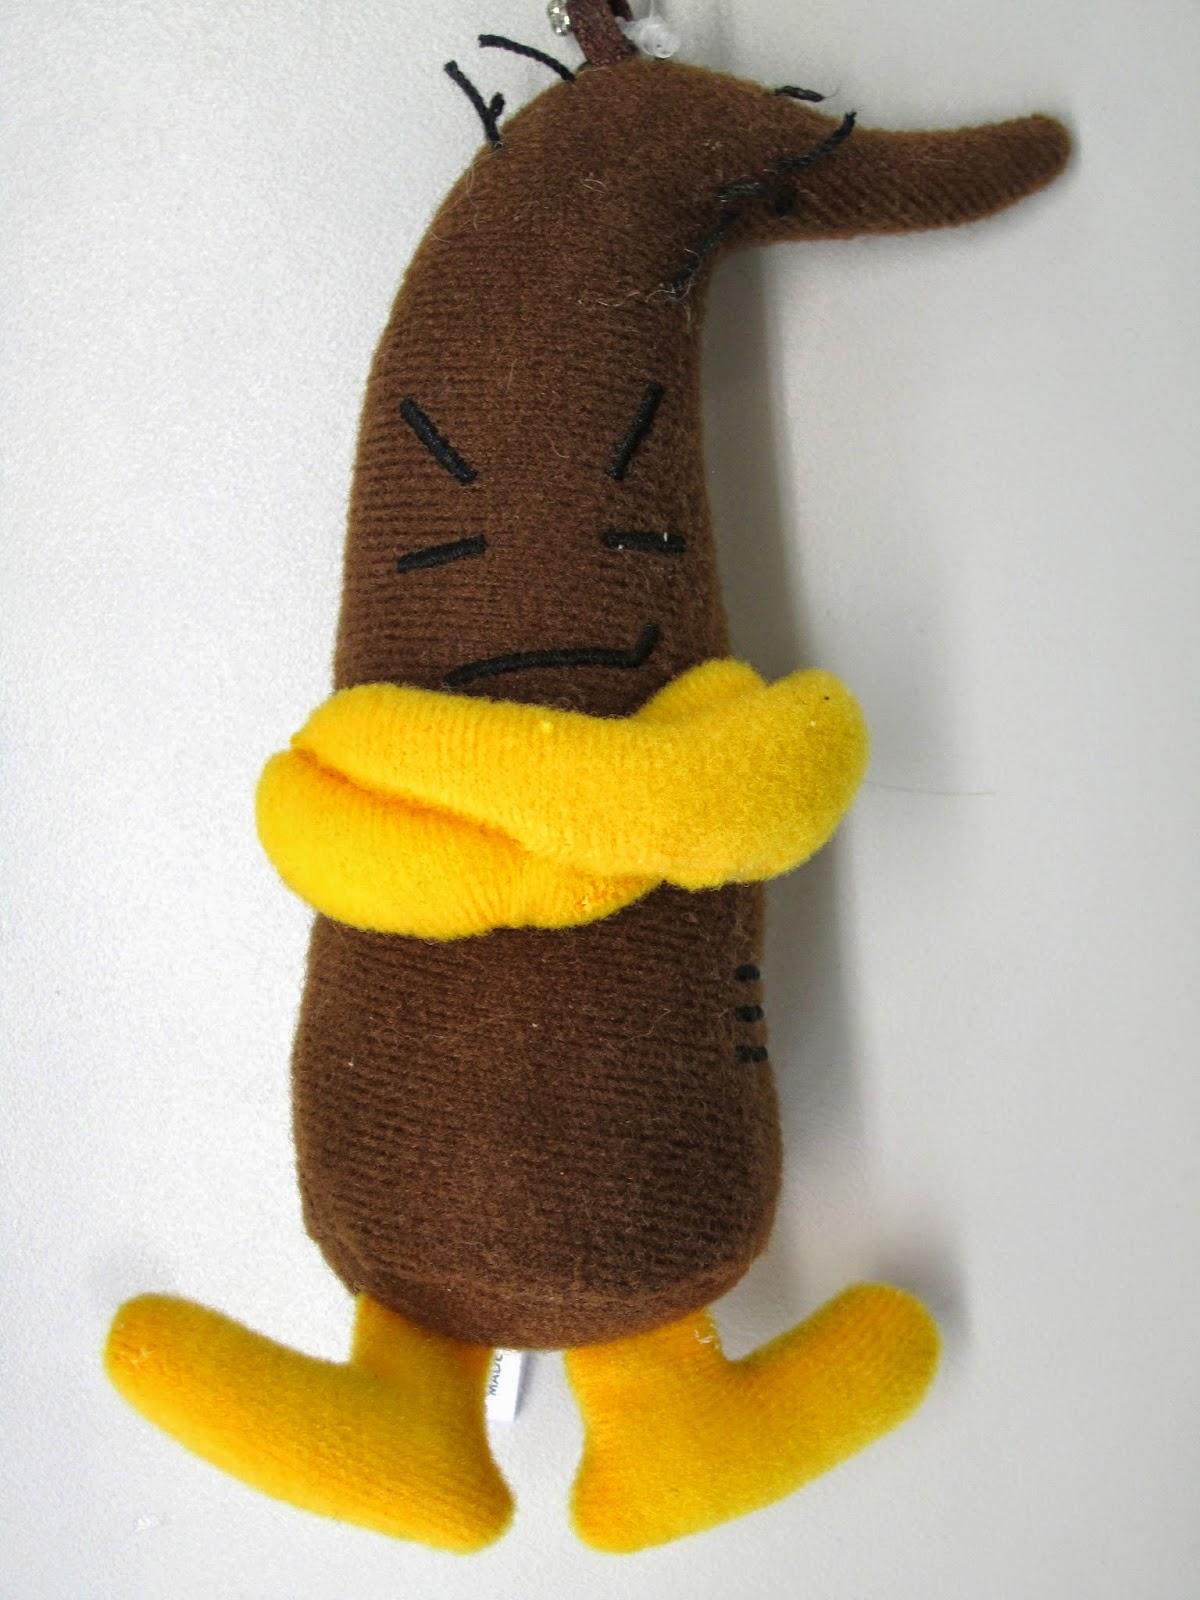 Towada Families Gonbou Gobou Burdock Root Mascot Character